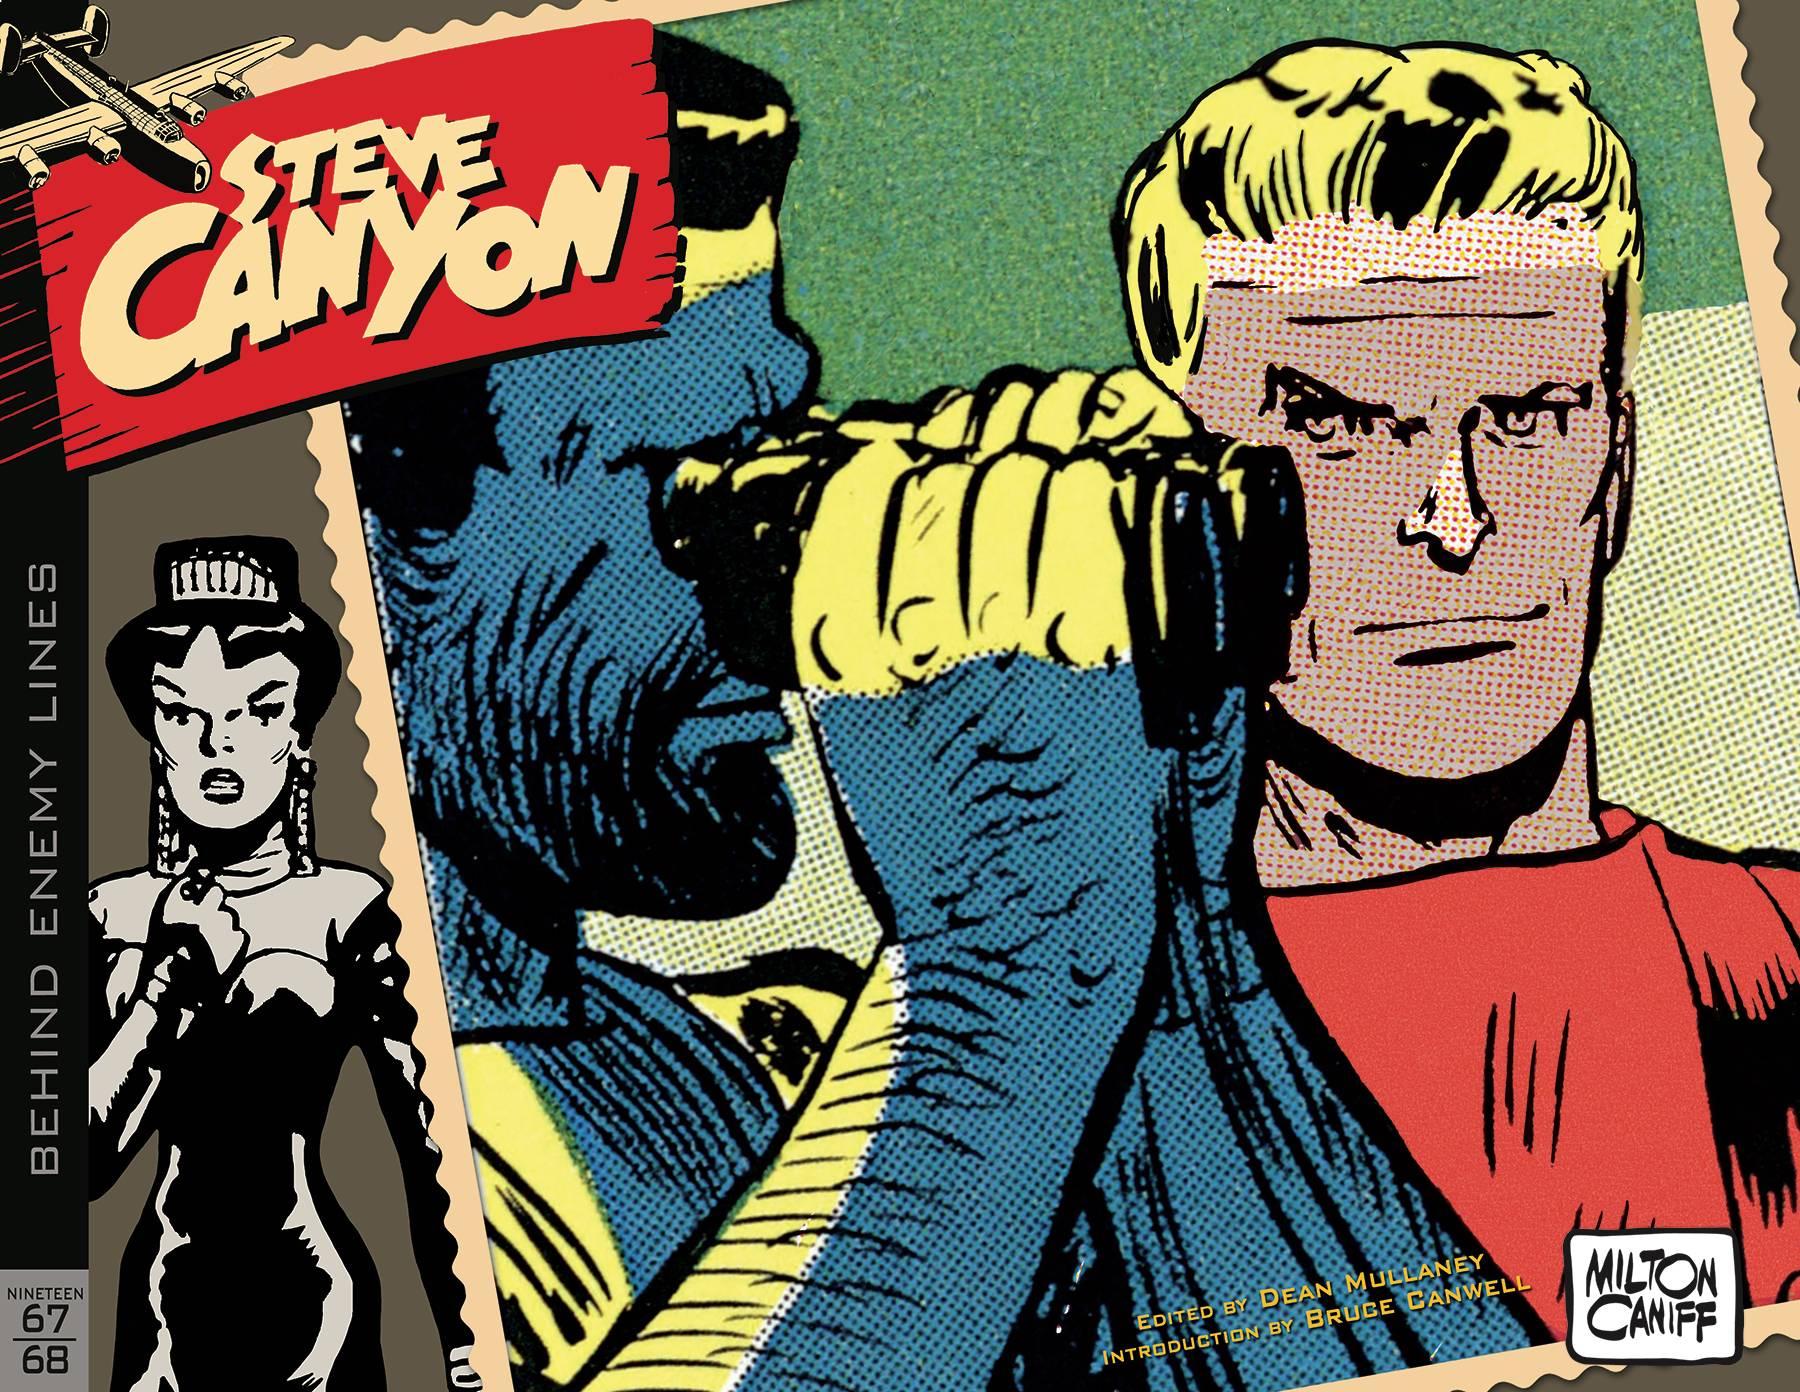 STEVE CANYON HC 11 1967 - 1968